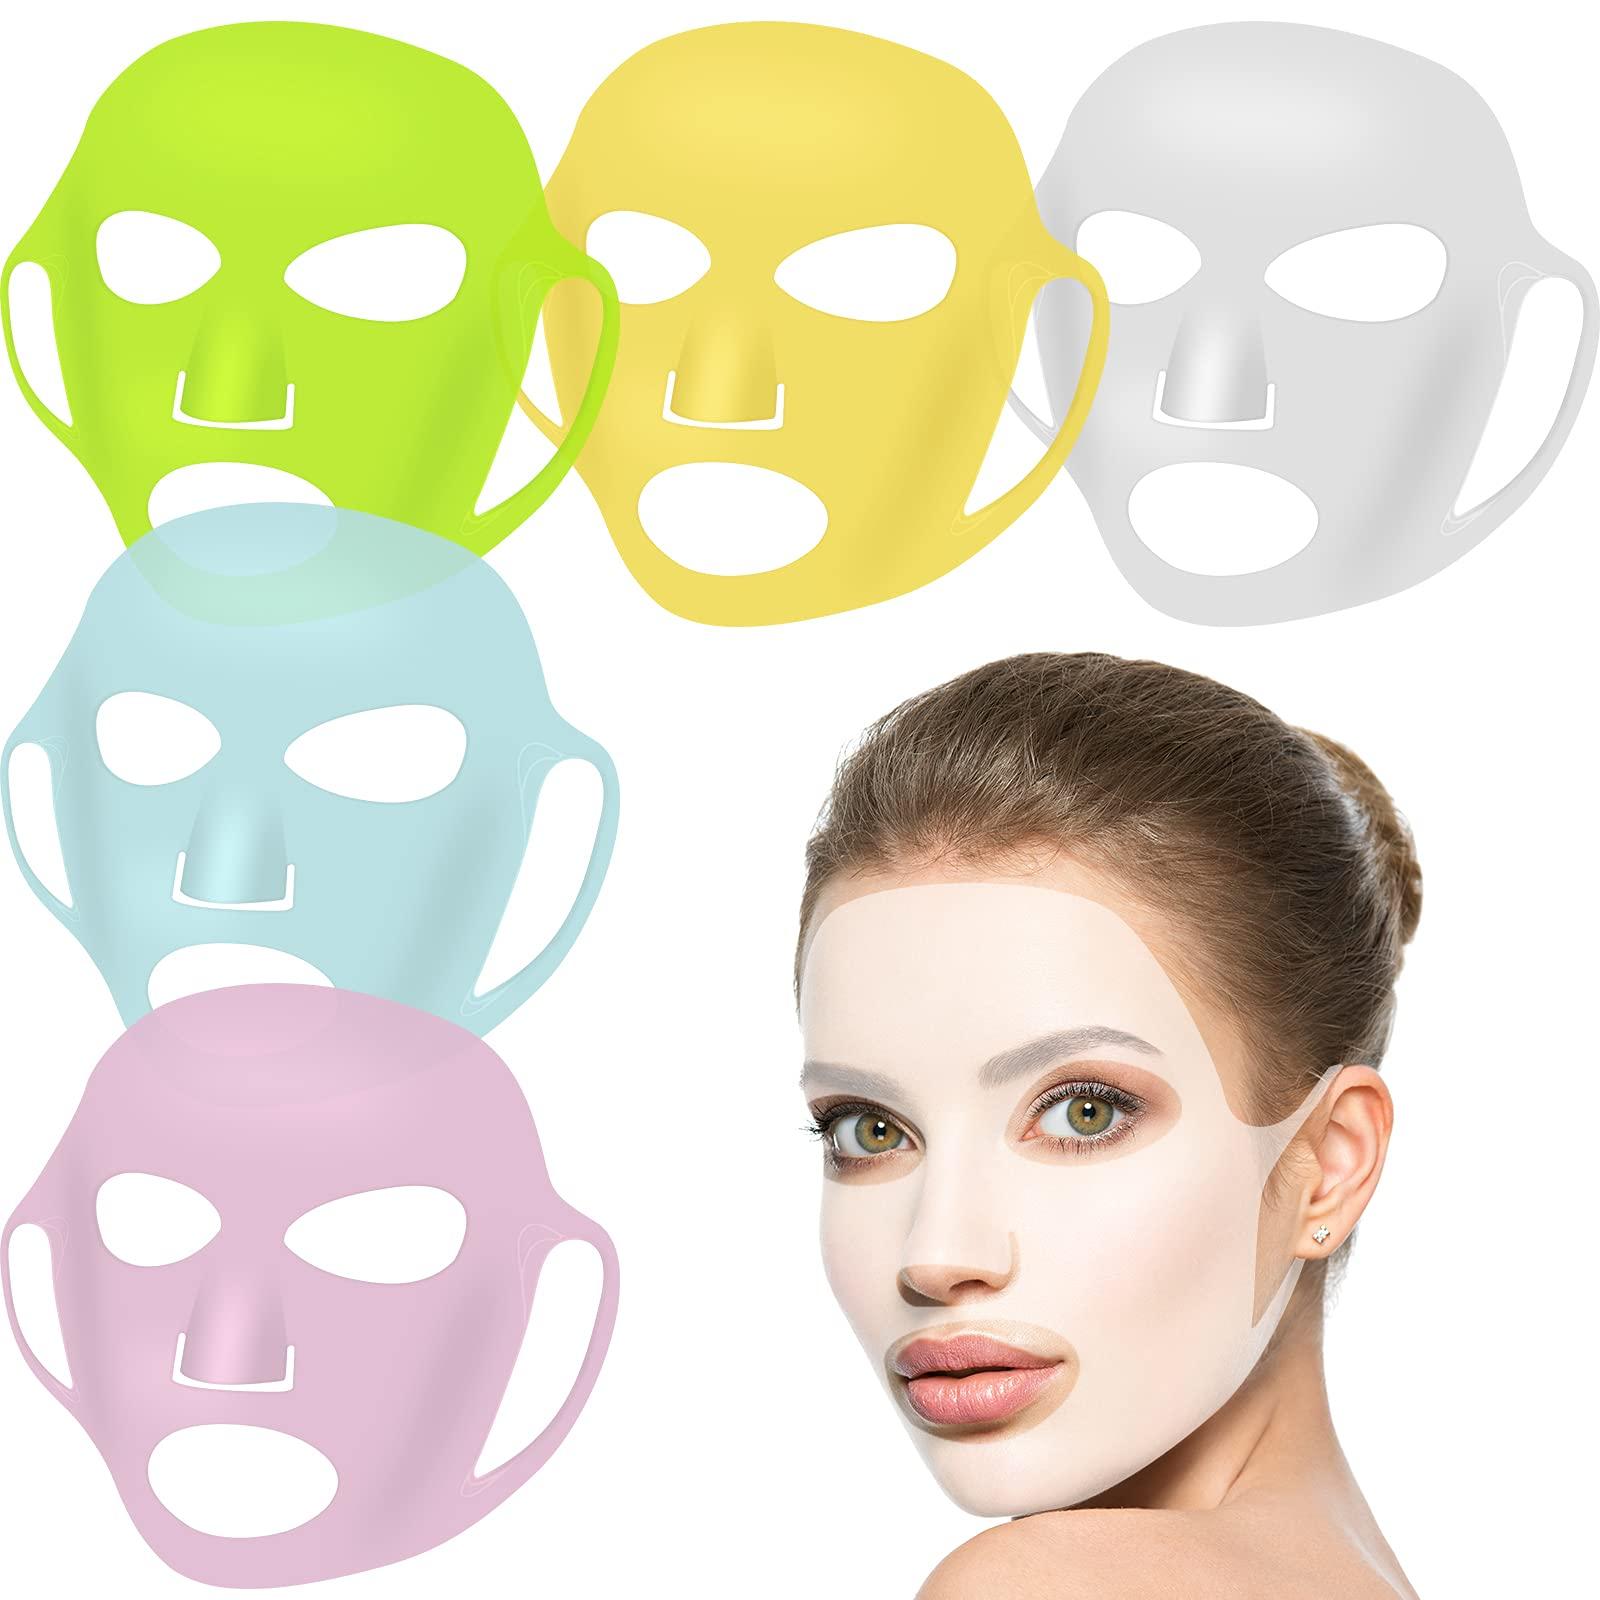 5 Pieces Reusable Silicone Facial Mask Facial Mask Cover Silicone Skin Mask Reusable Moisturizing Face Silicone Face Wrap for Sheet Prevent Evaporation Masks Face Care Tool (Chic Colors)